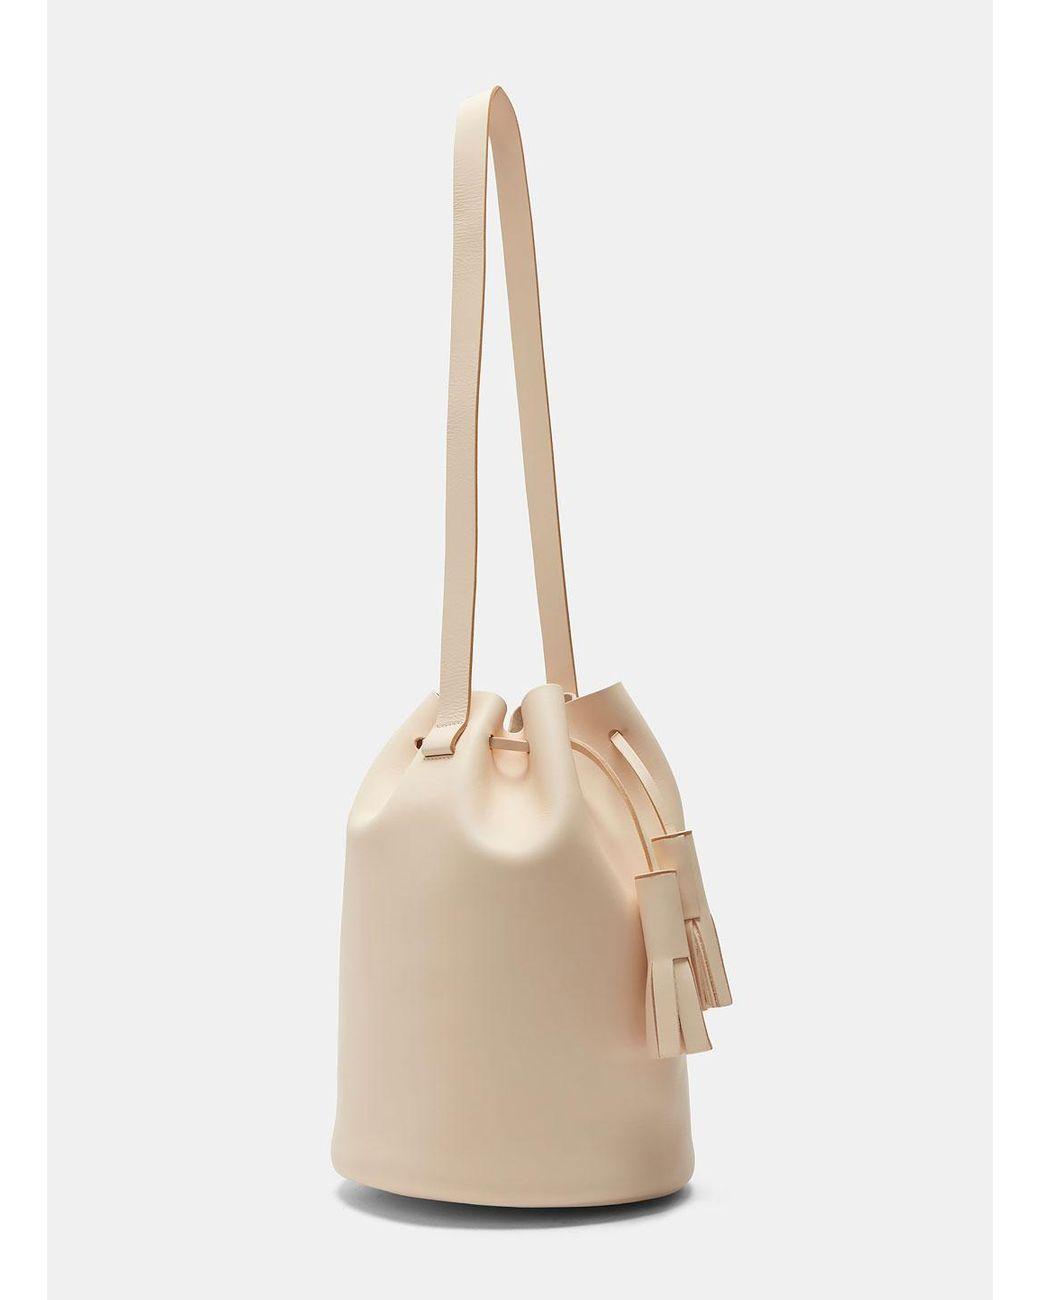 Jennifer PU Leather Top-Handle Handbags Bohemia Feather Single-Shoulder Tote Crossbody Bag Messenger Bags For Women